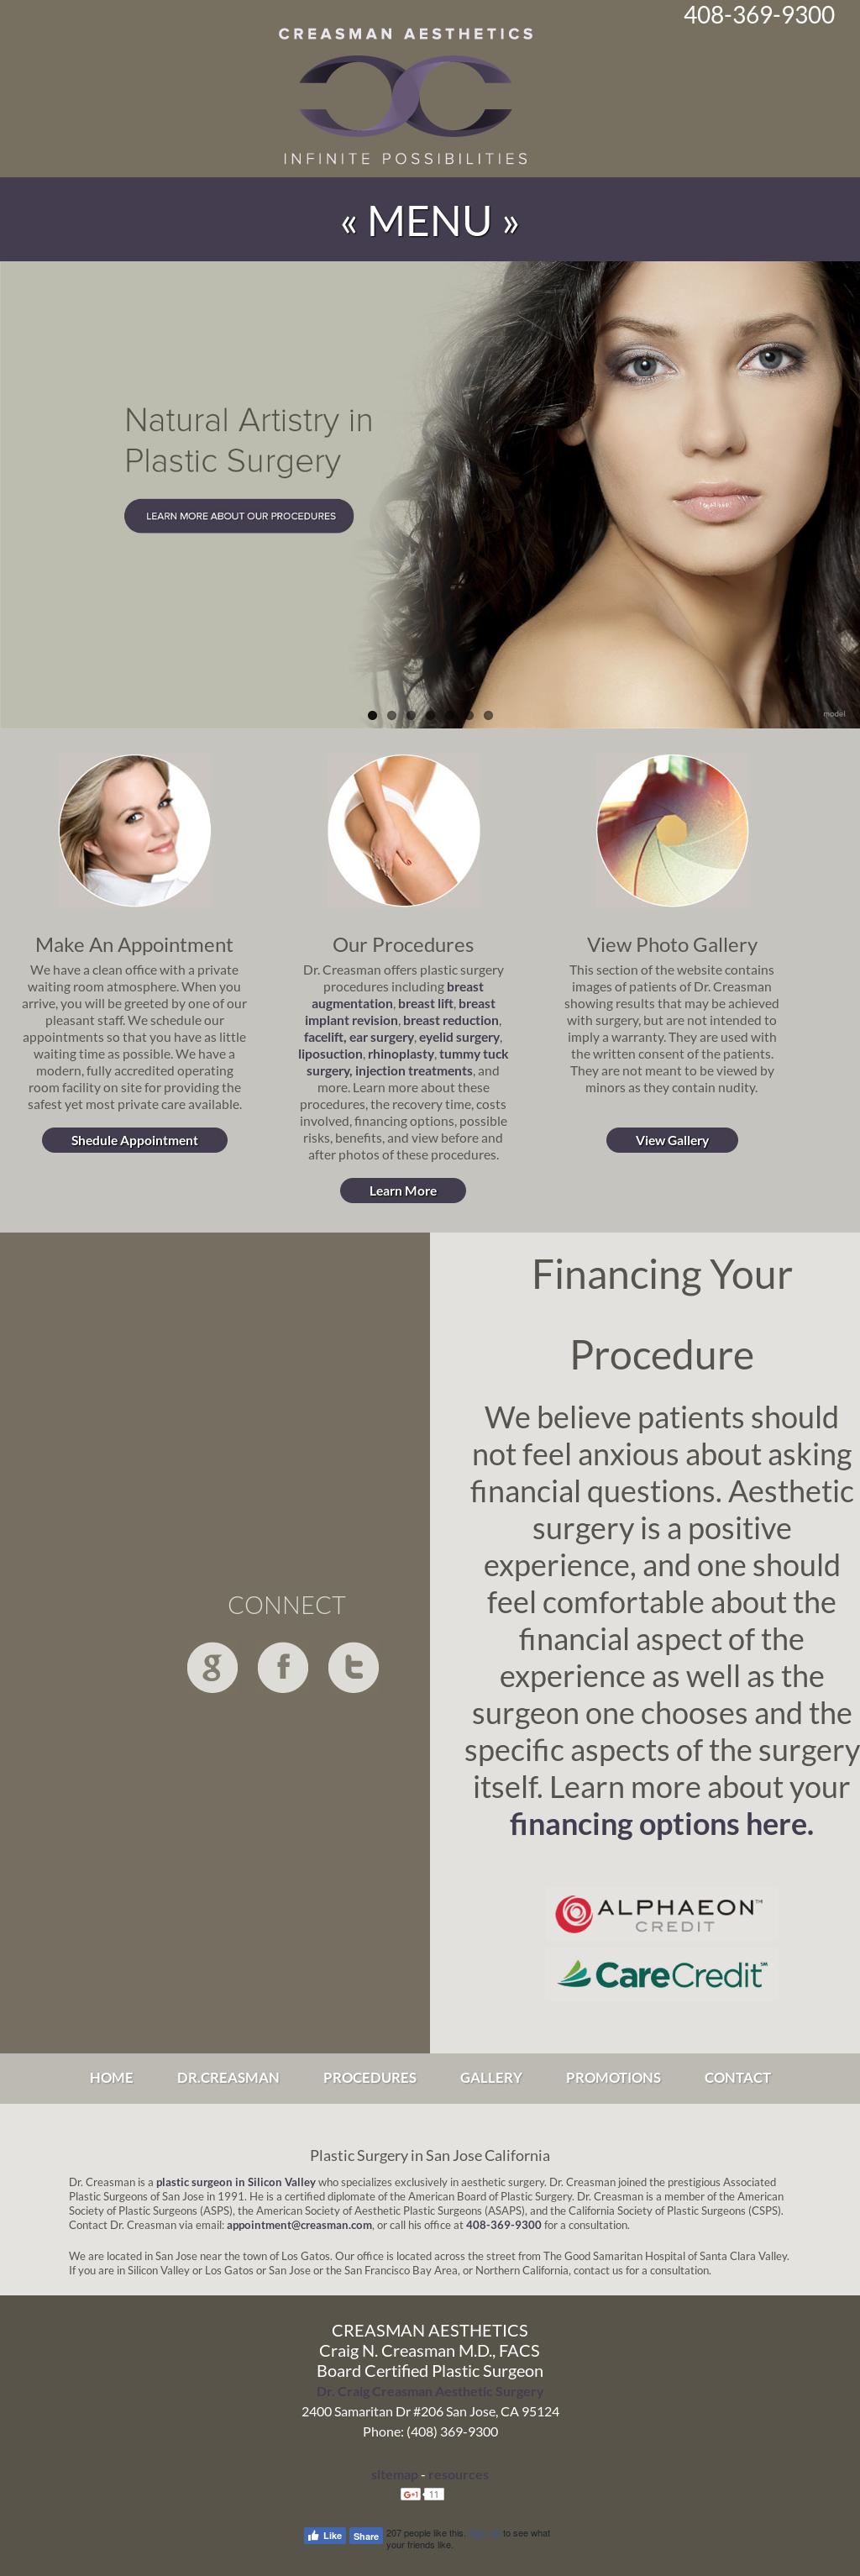 Dr  Craig Creasman: Aesthetic Surgery For Silicon Valley